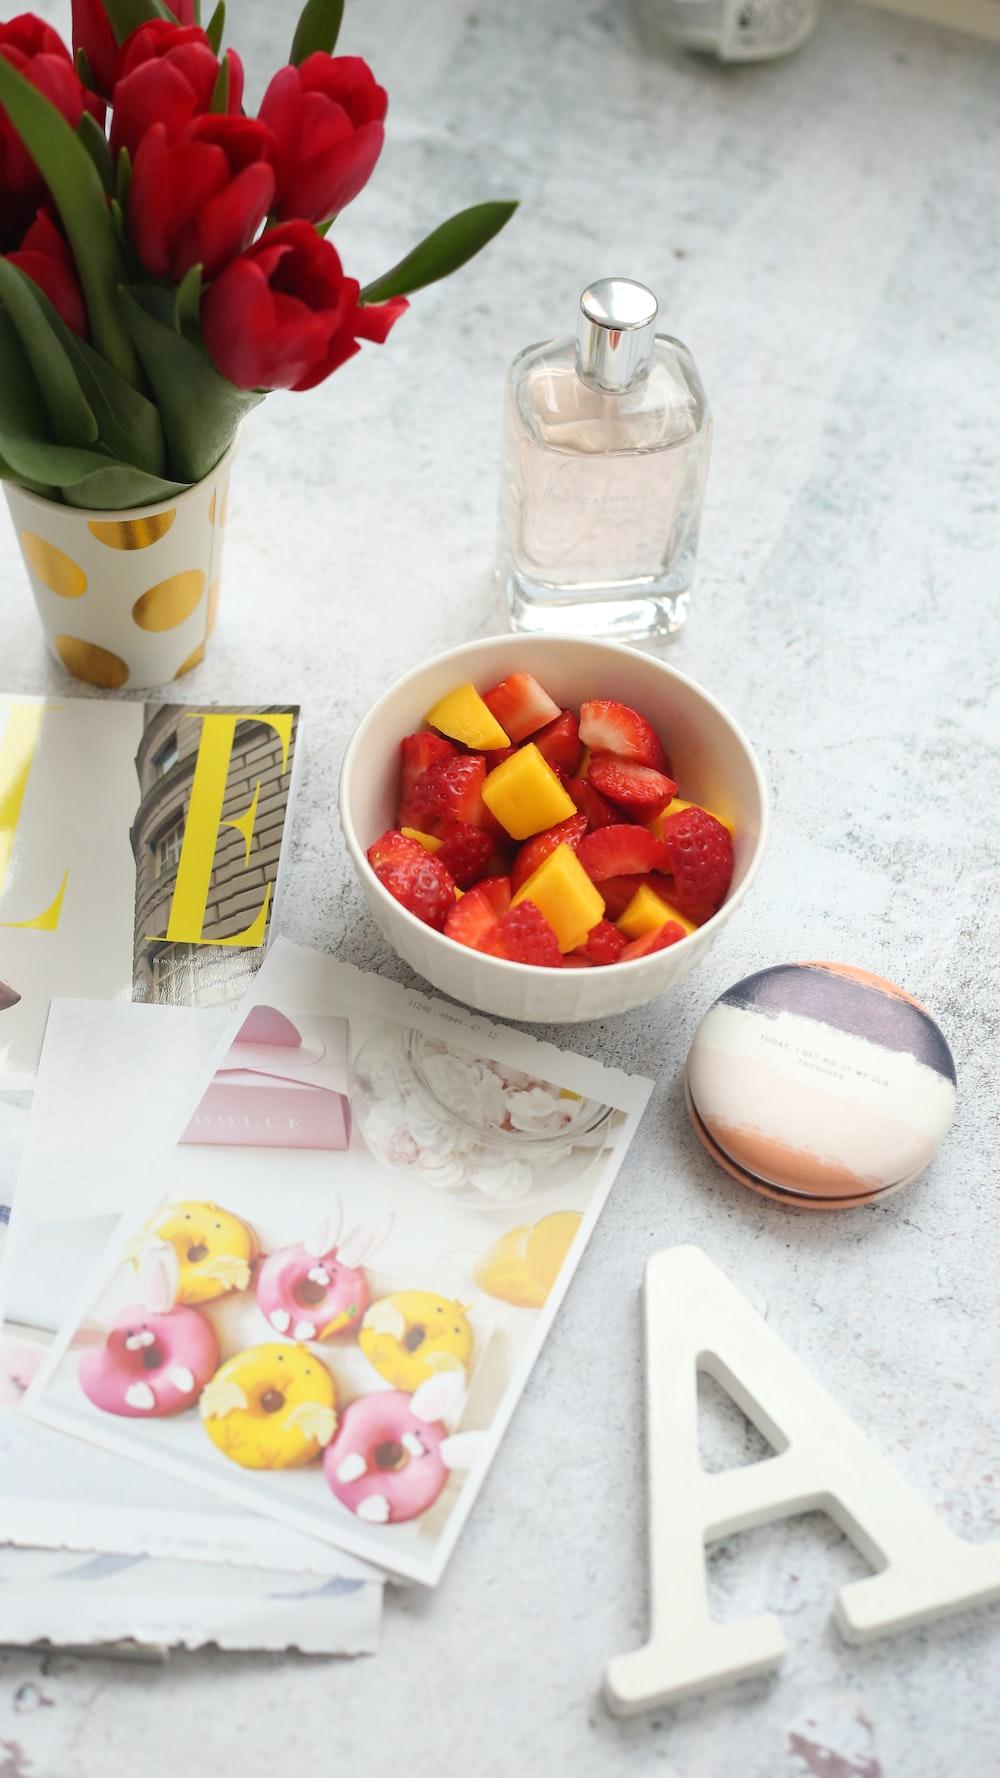 sliced strawberries on bowl beside clear glass bottle